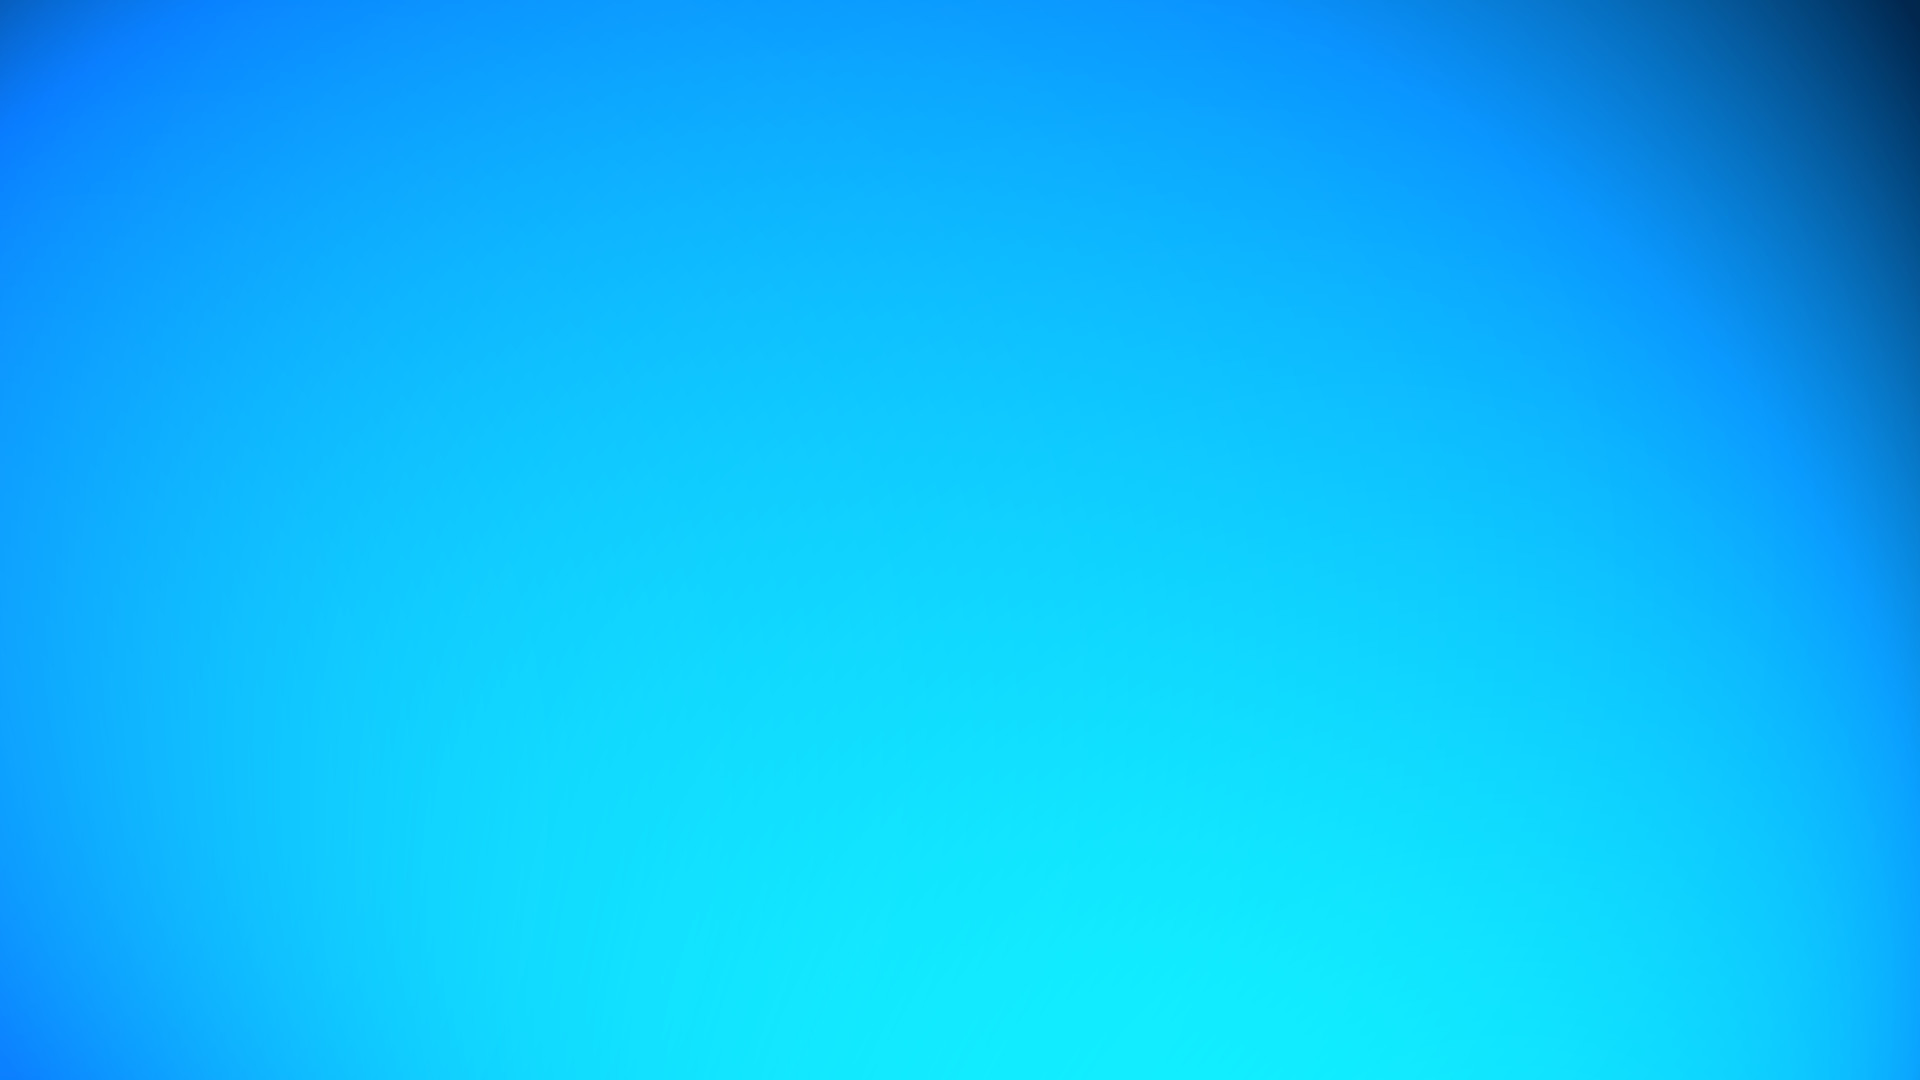 Res: 1920x1080, Blue gradient Wallpaper 1080p.